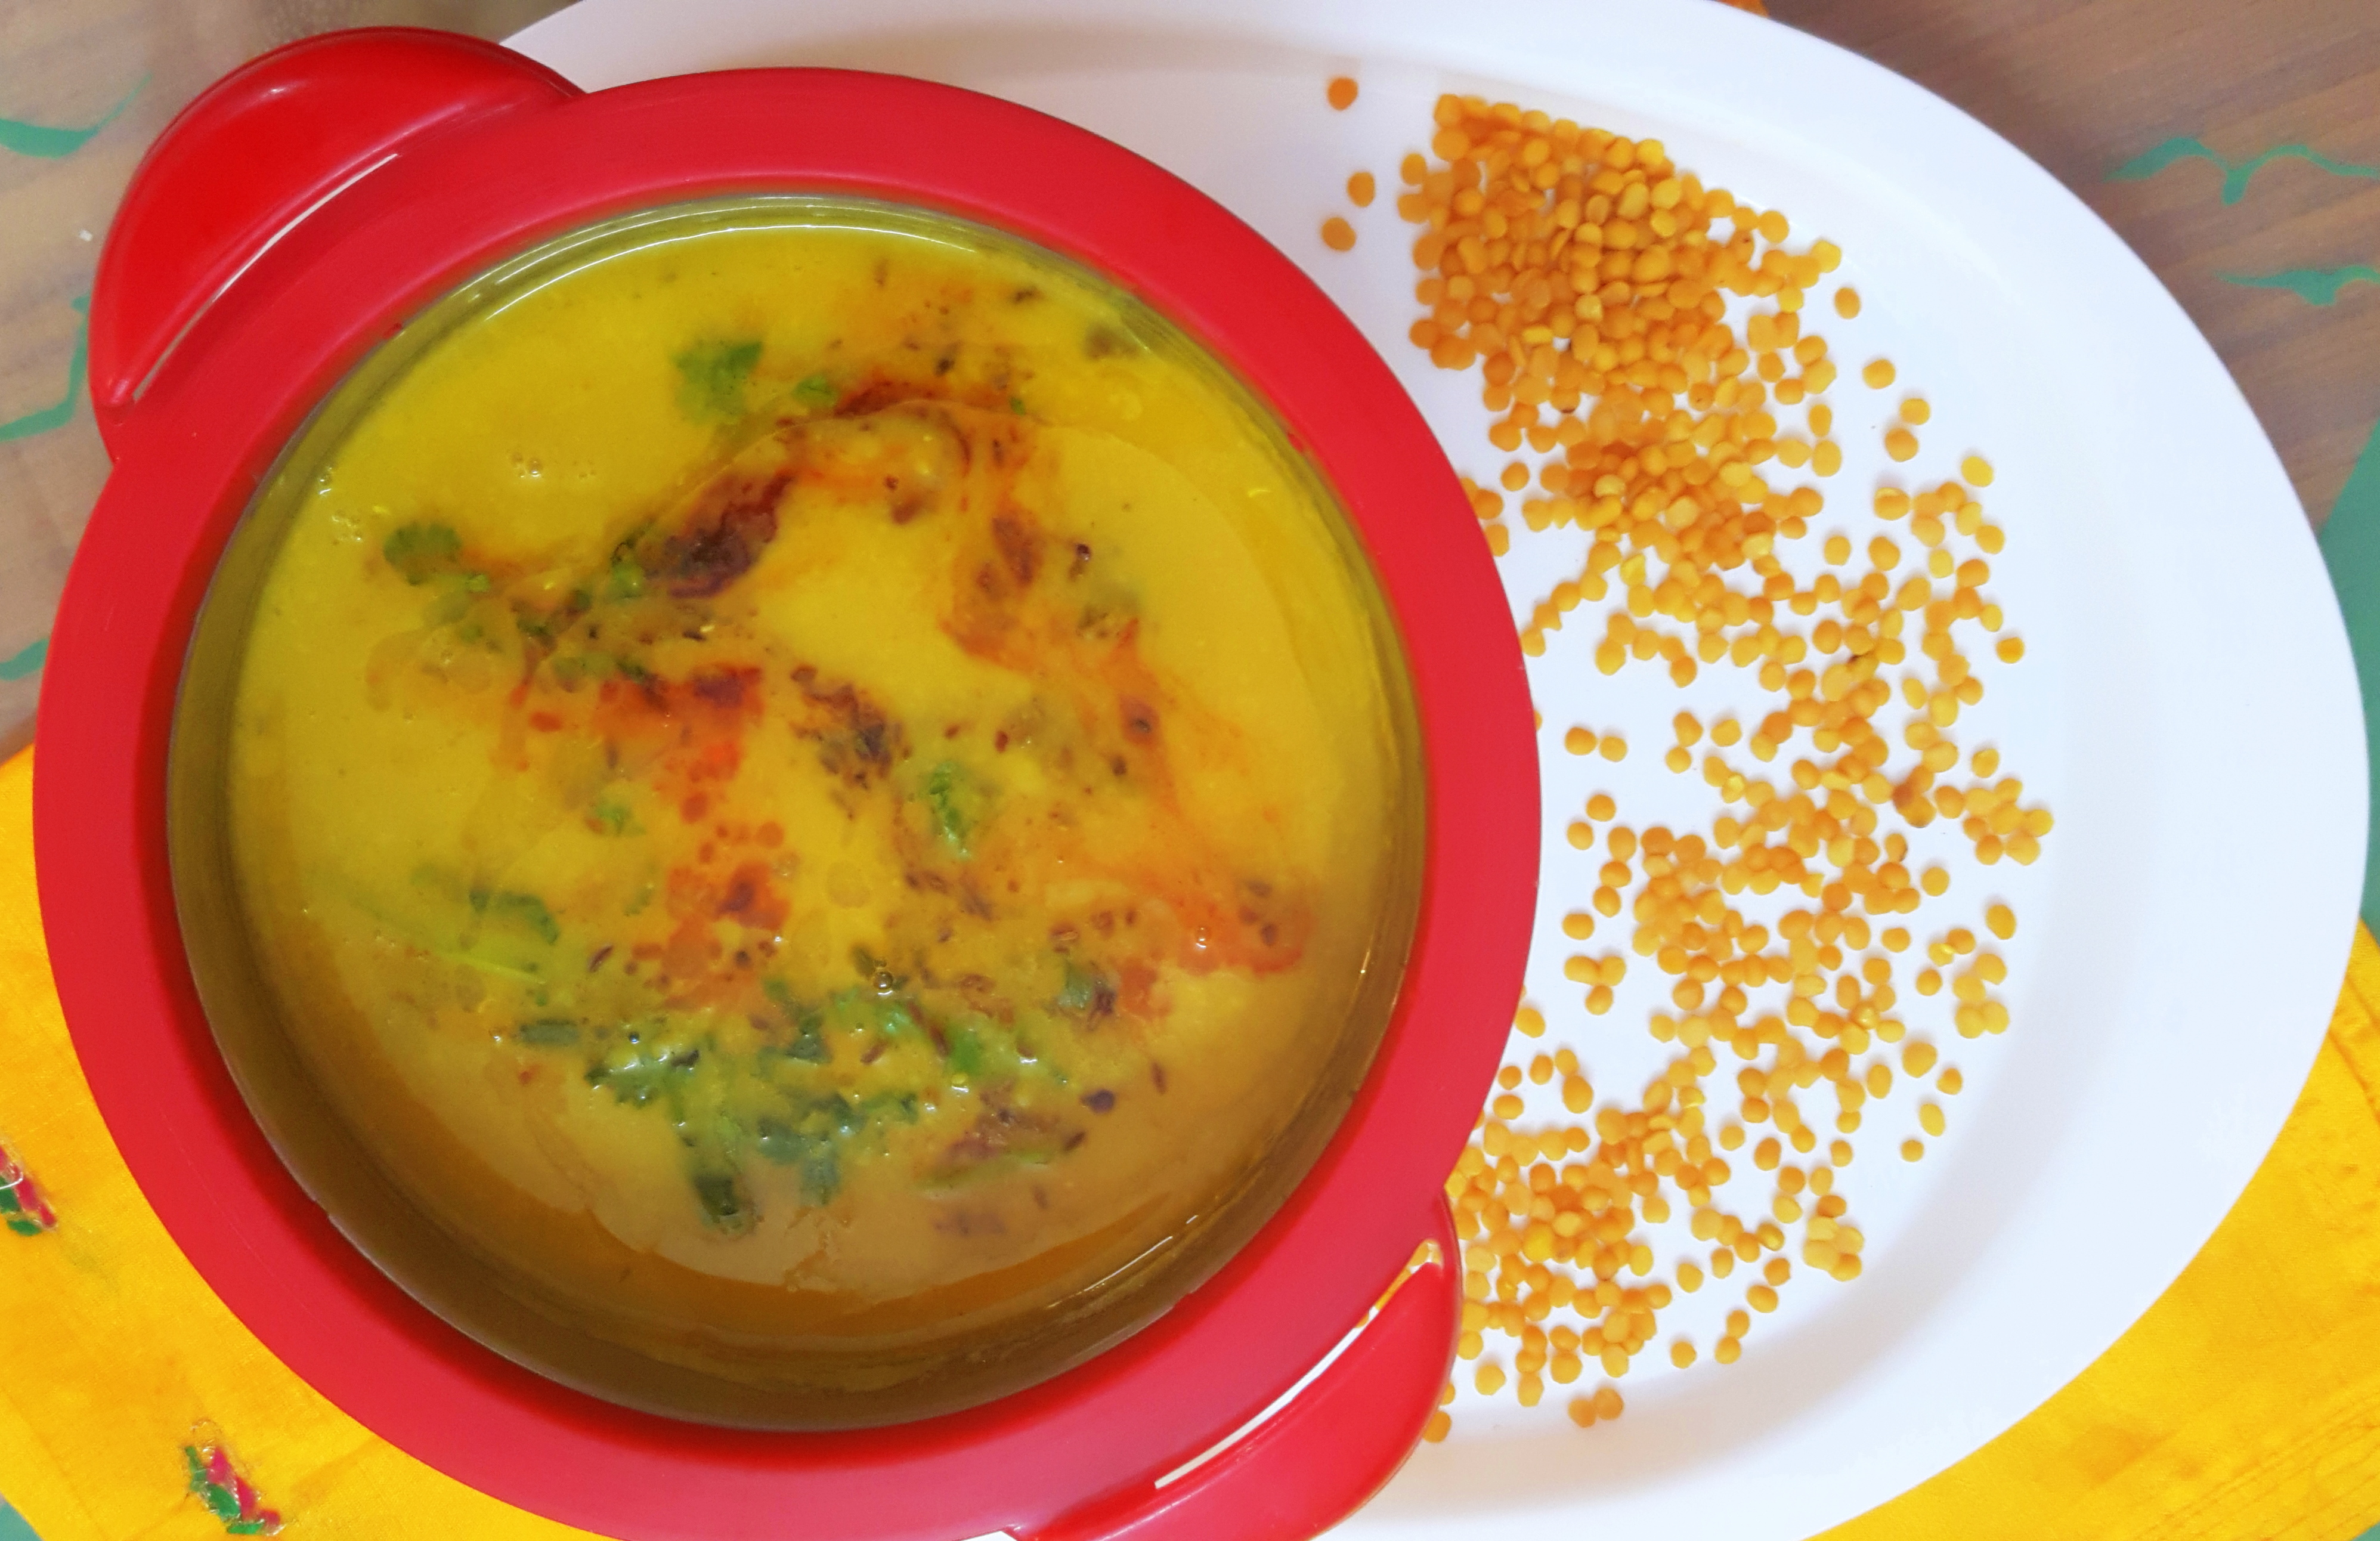 Toovar/arhar ki dal fry (pigeon pea lentil fry)